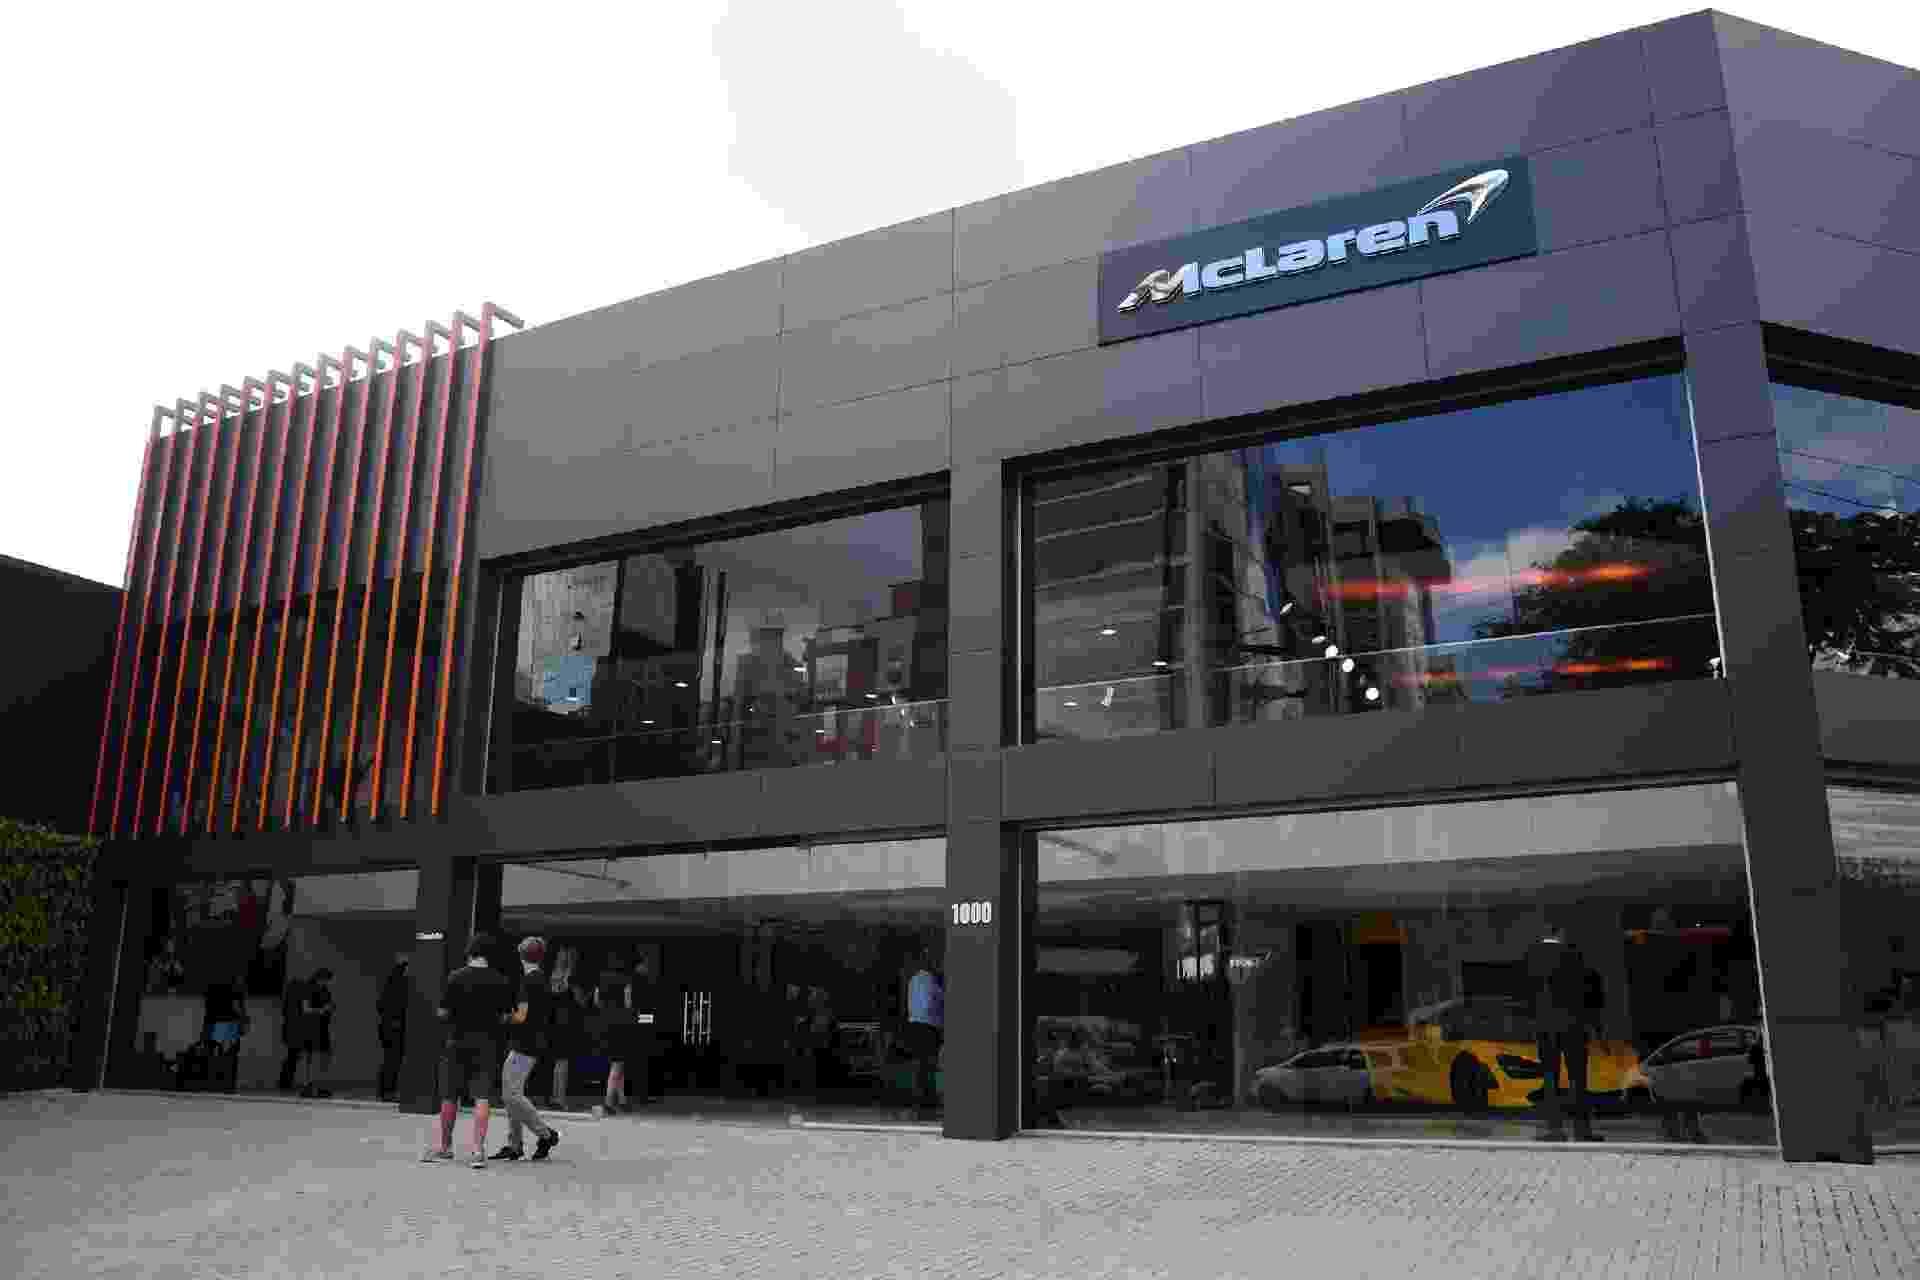 Loja McLaren em São Paulo, SP - Murilo Góes/UOL